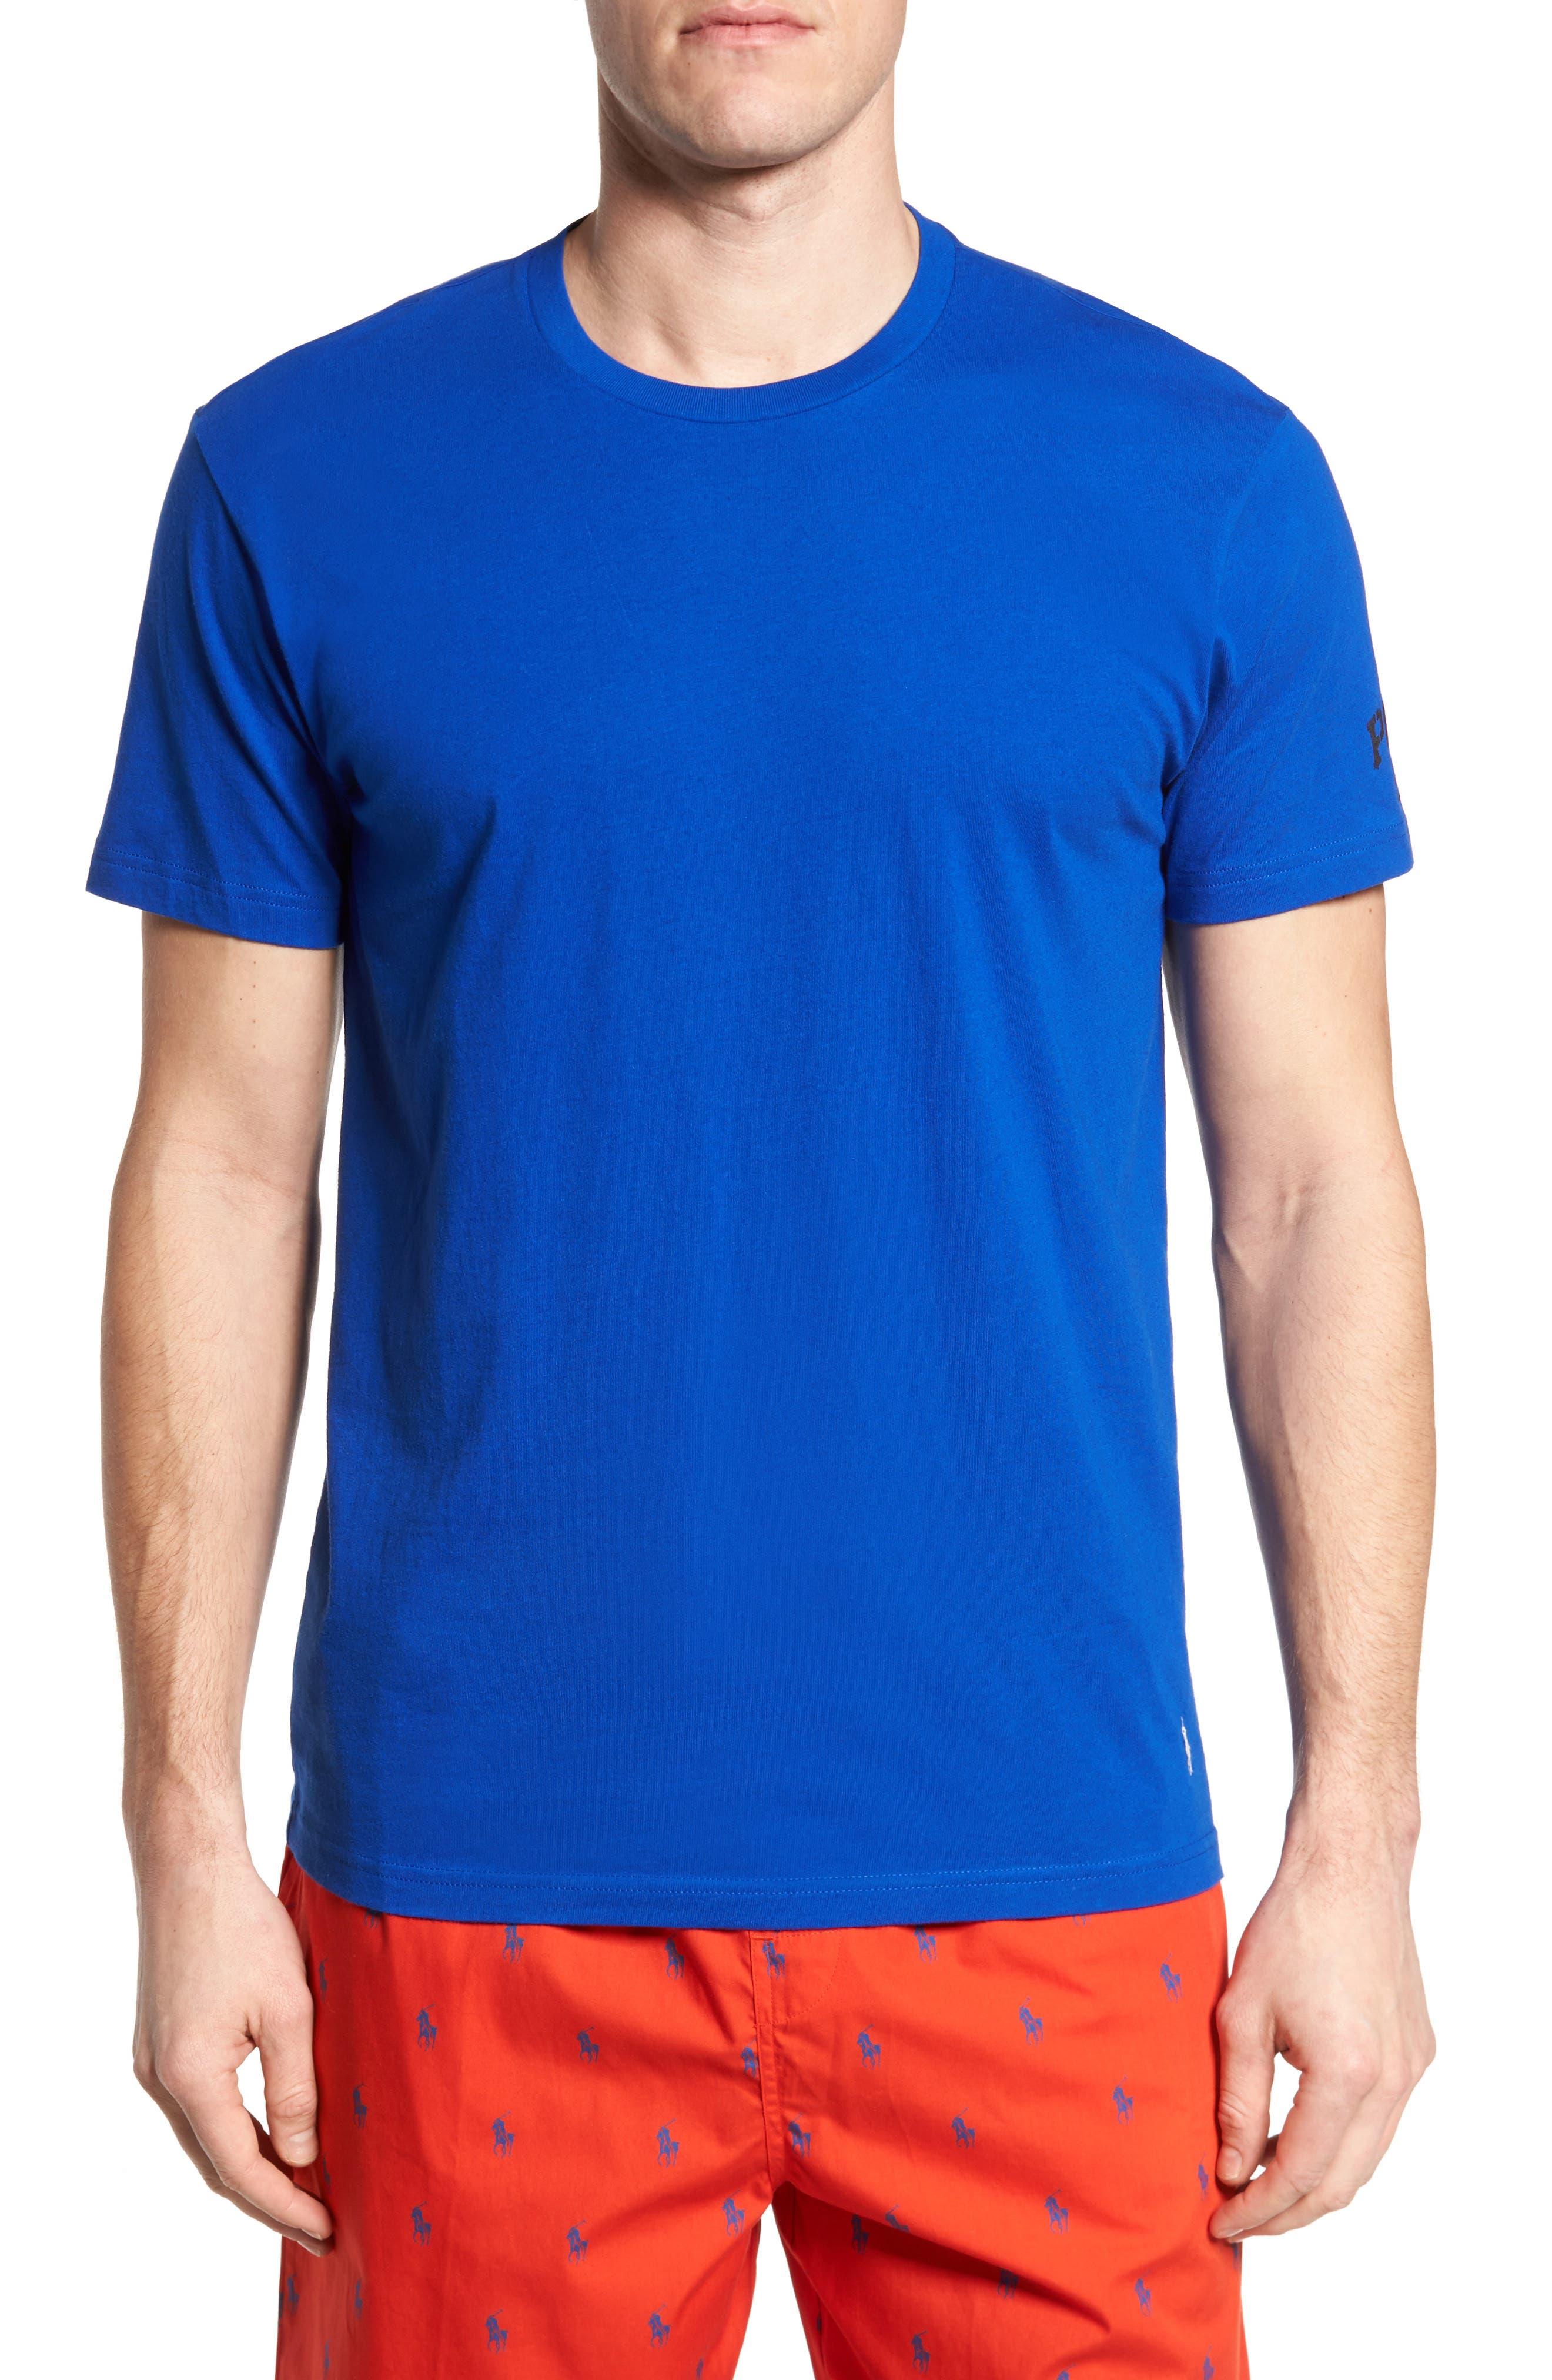 Polo Ralph Lauren Crewneck T-Shirt,                             Main thumbnail 1, color,                             Sapphire Star/ Crescent Cream